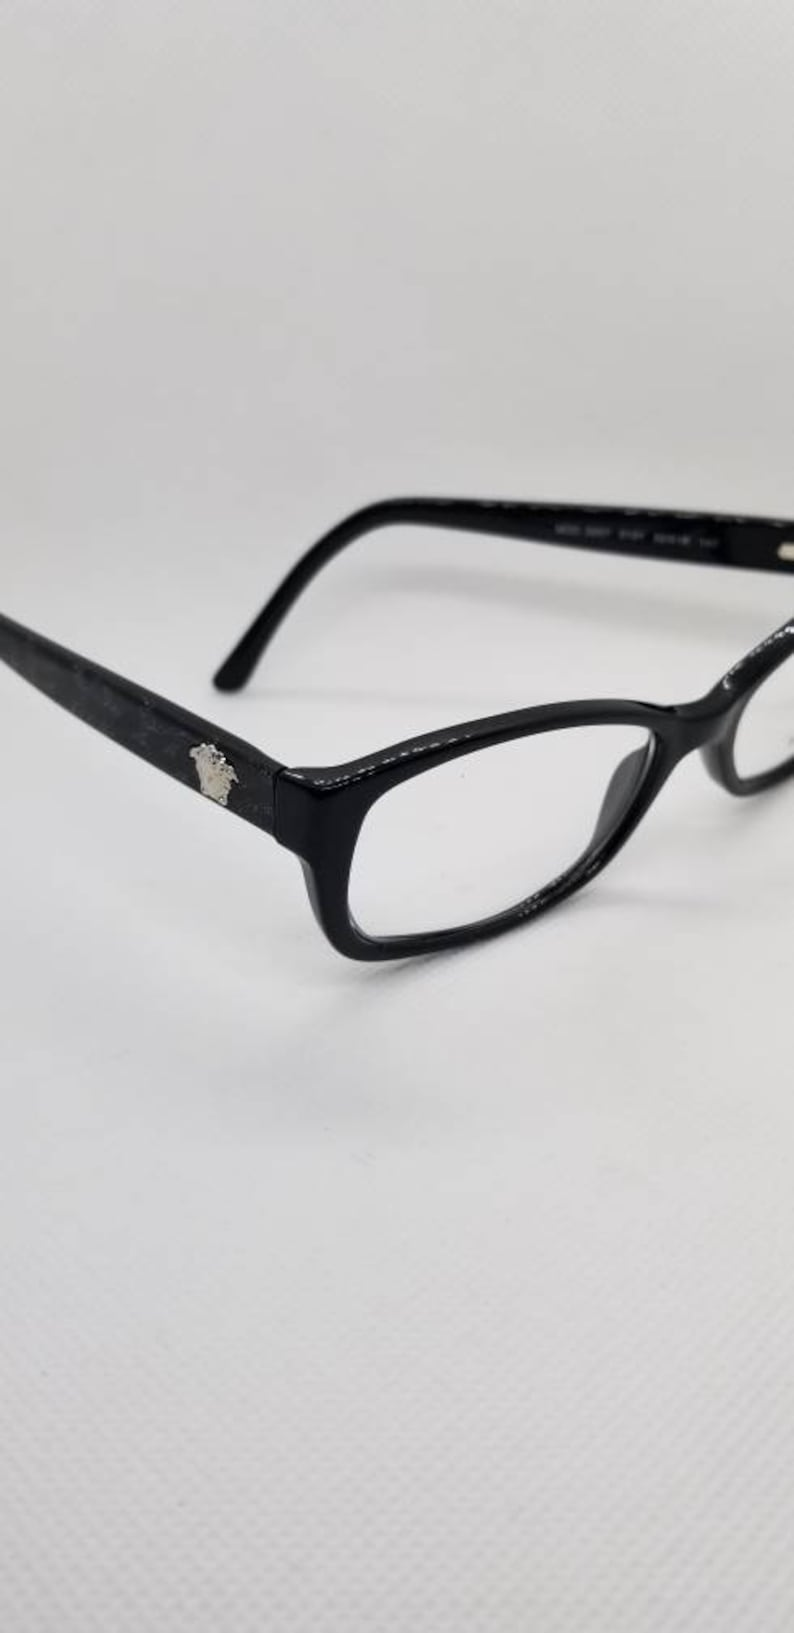 6097bb5ec1b1c Vintage New Old Stock Versace Eyeglasses Frames Mod 3207 DEMO